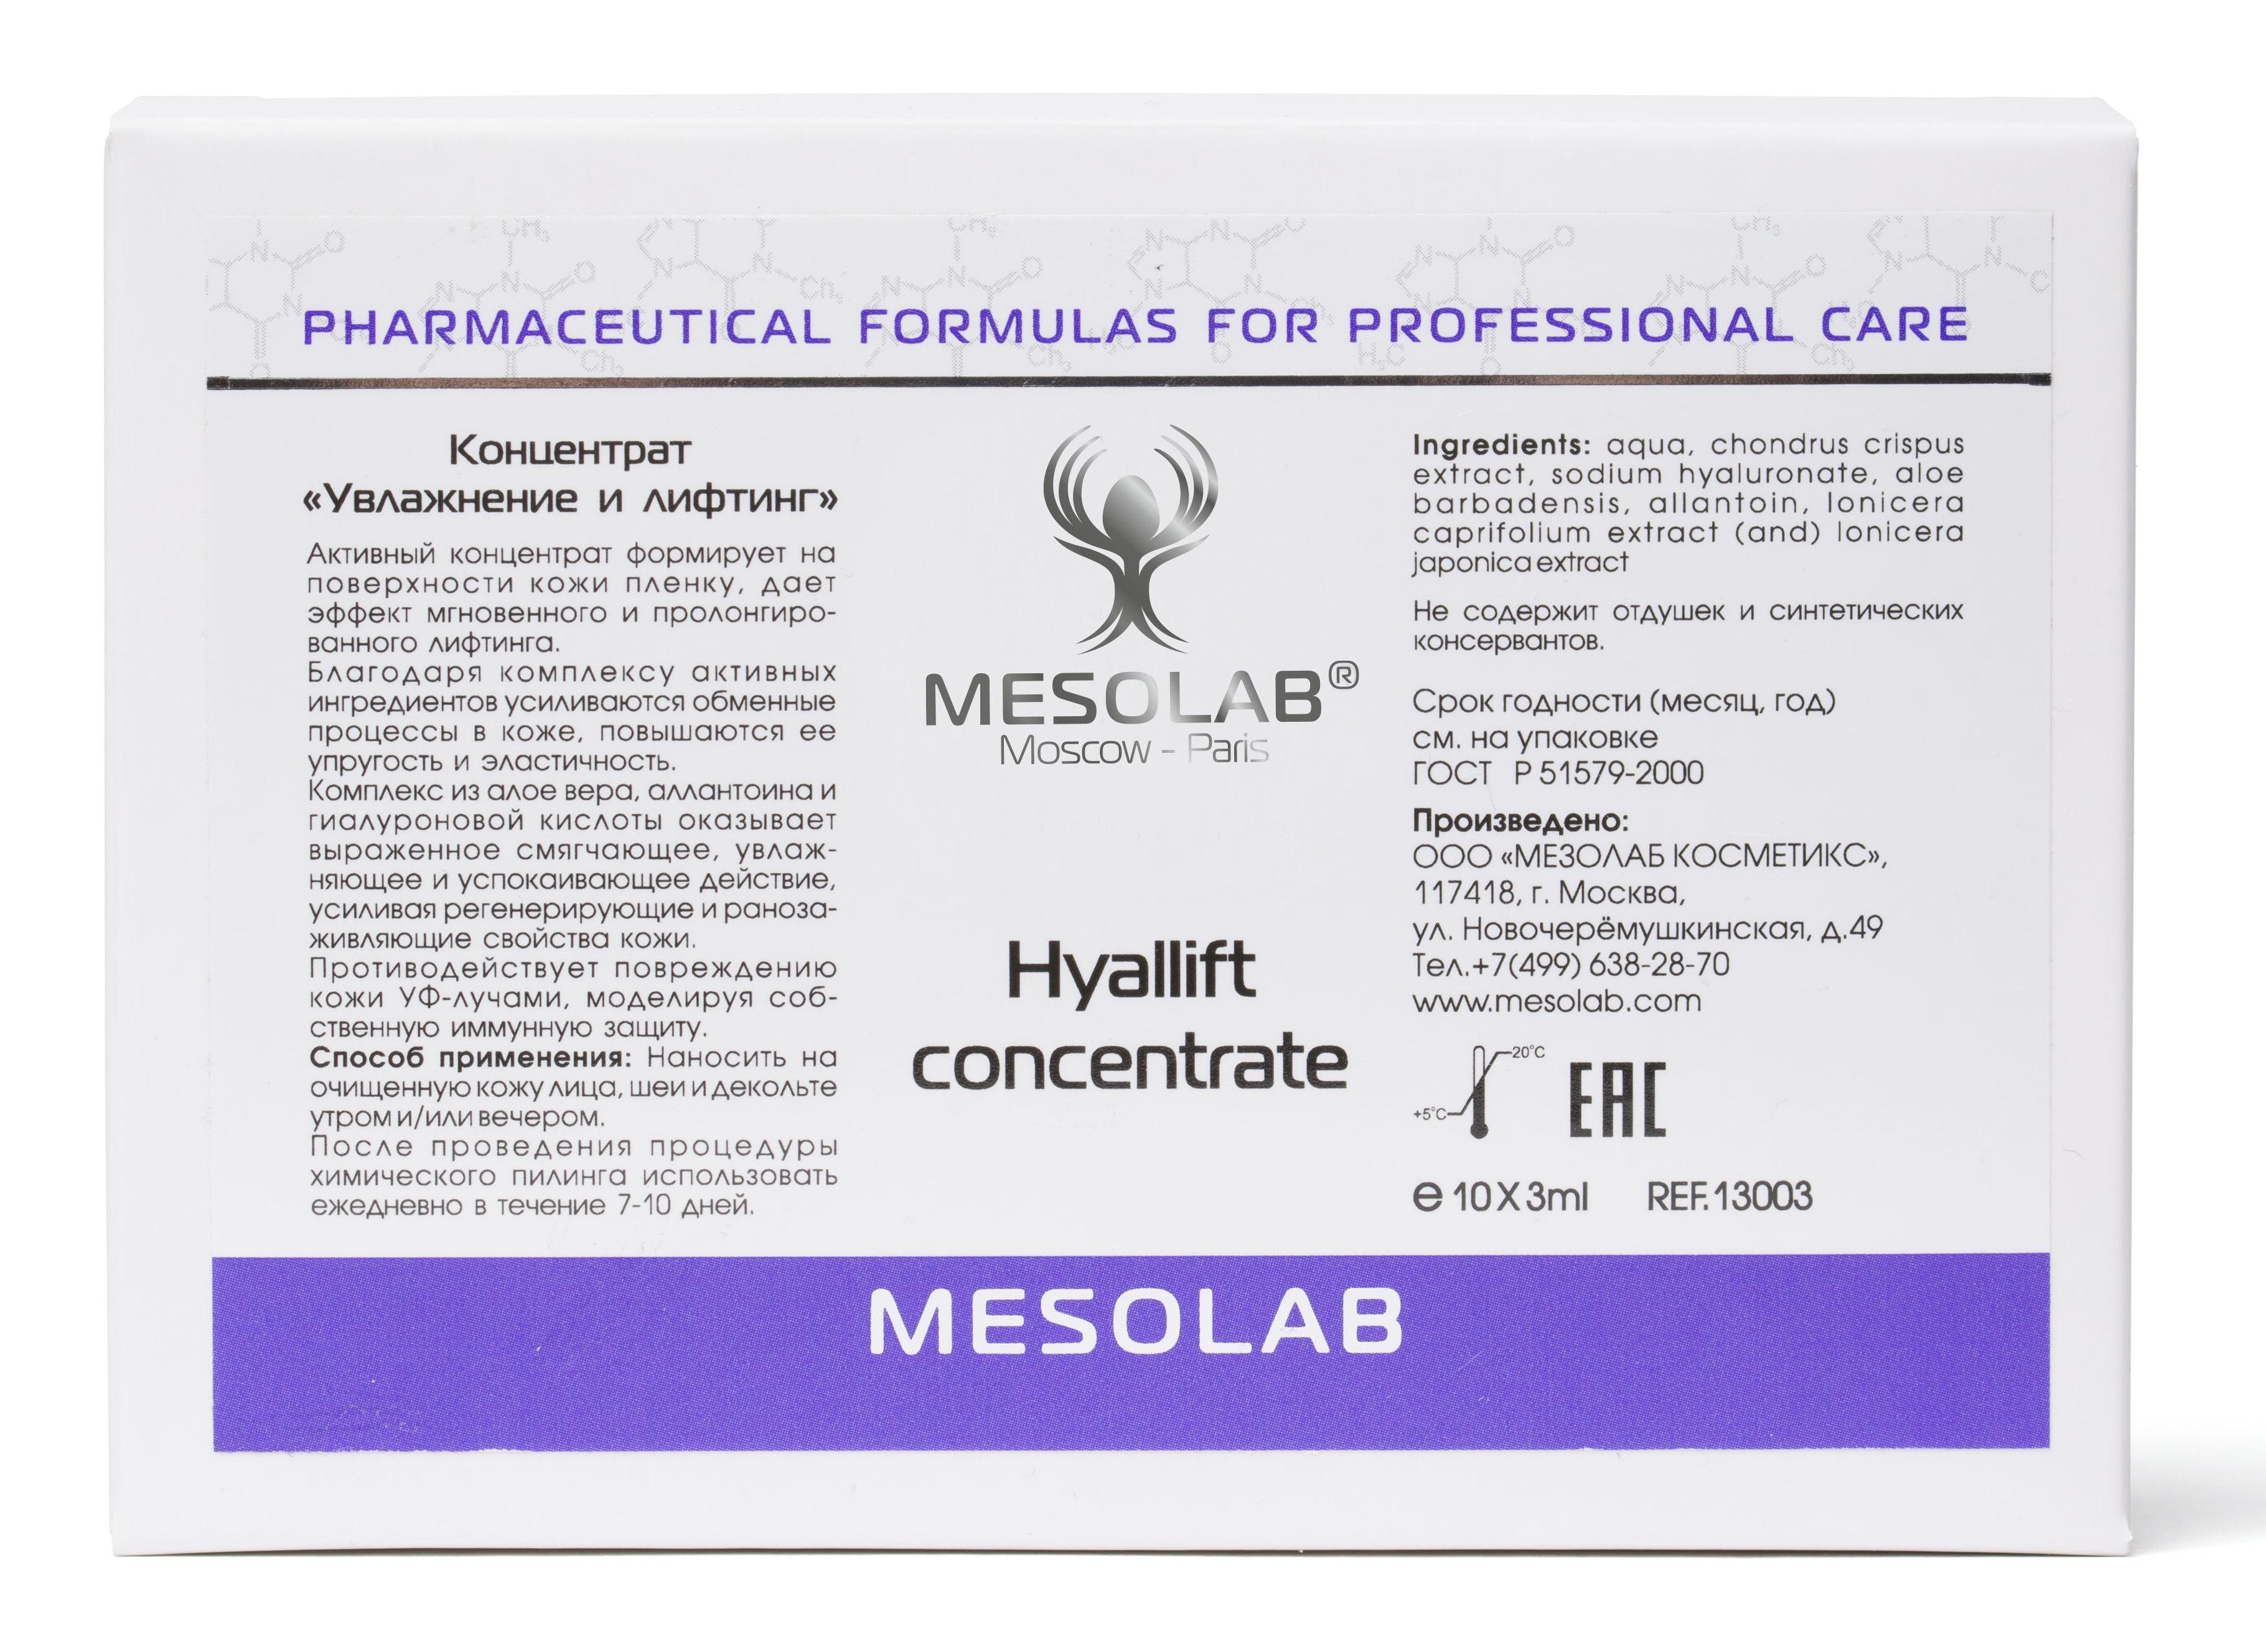 MESOLAB Концентрат с лифтинговым эффектом / CONCENTRATE HYALLIFT 10*3 мл